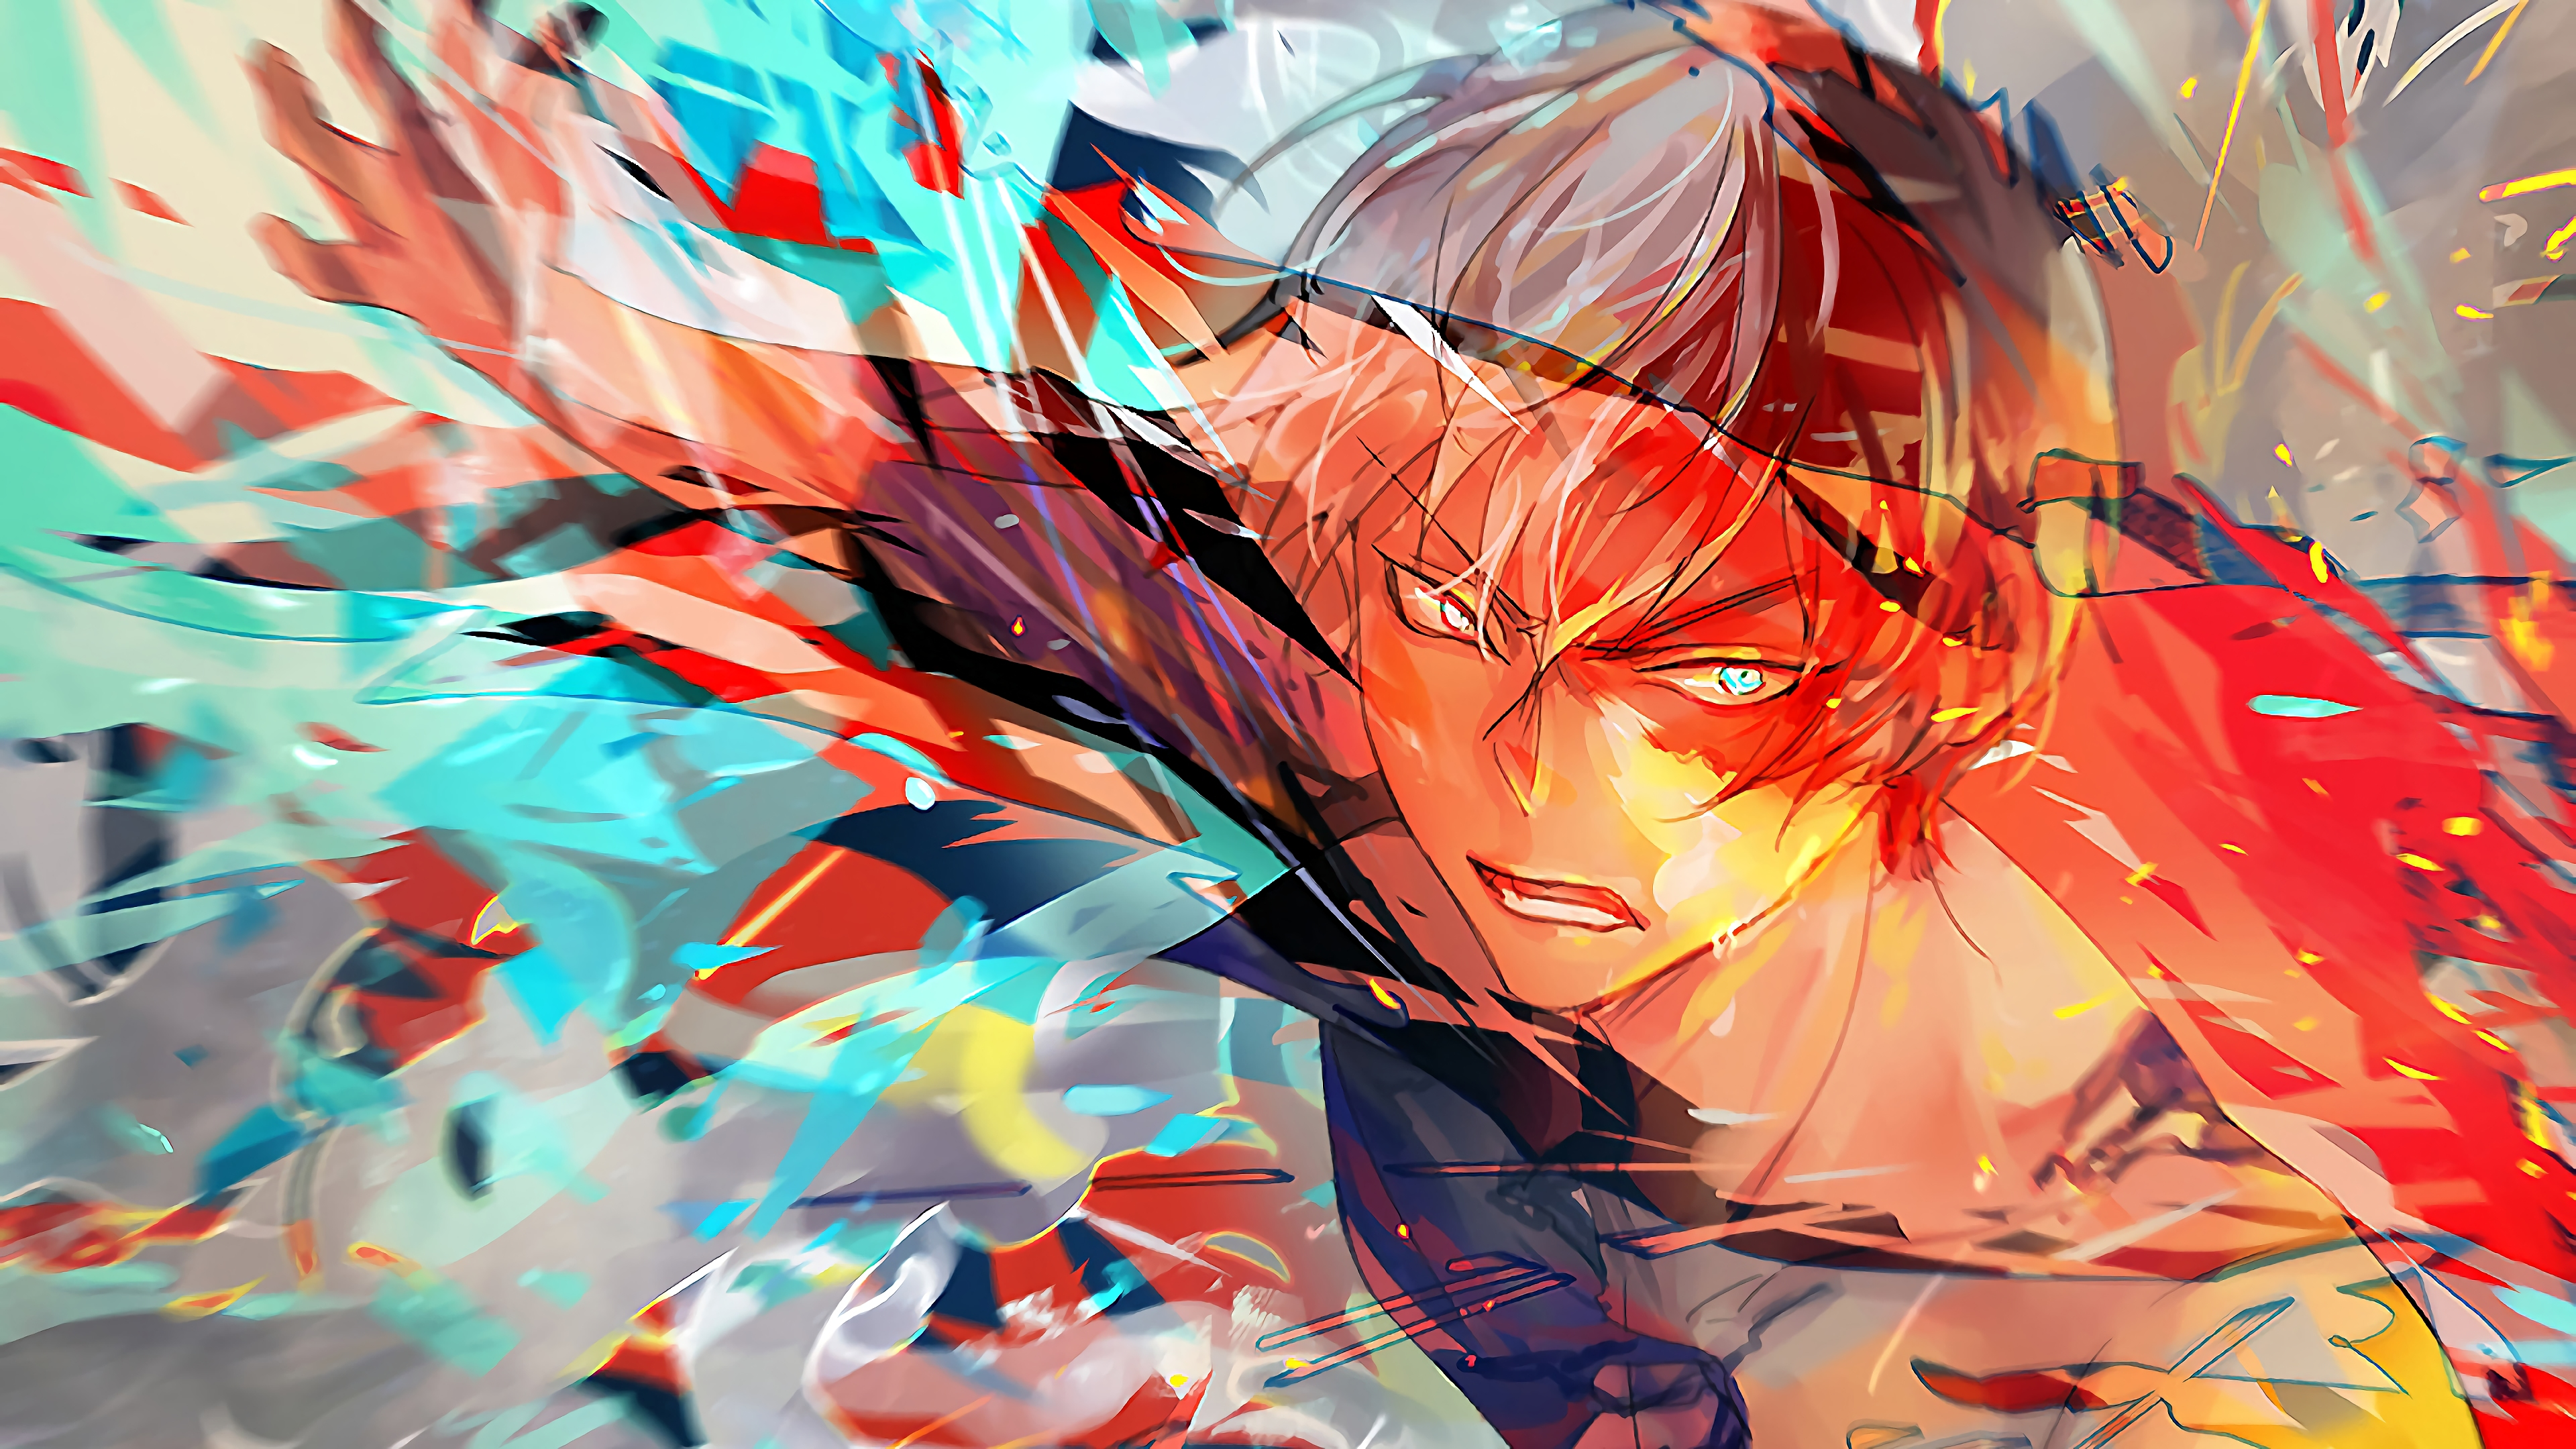 Wallpaper 4k Shoto Todoroki My Hero Academia 4k Wallpapers Anime